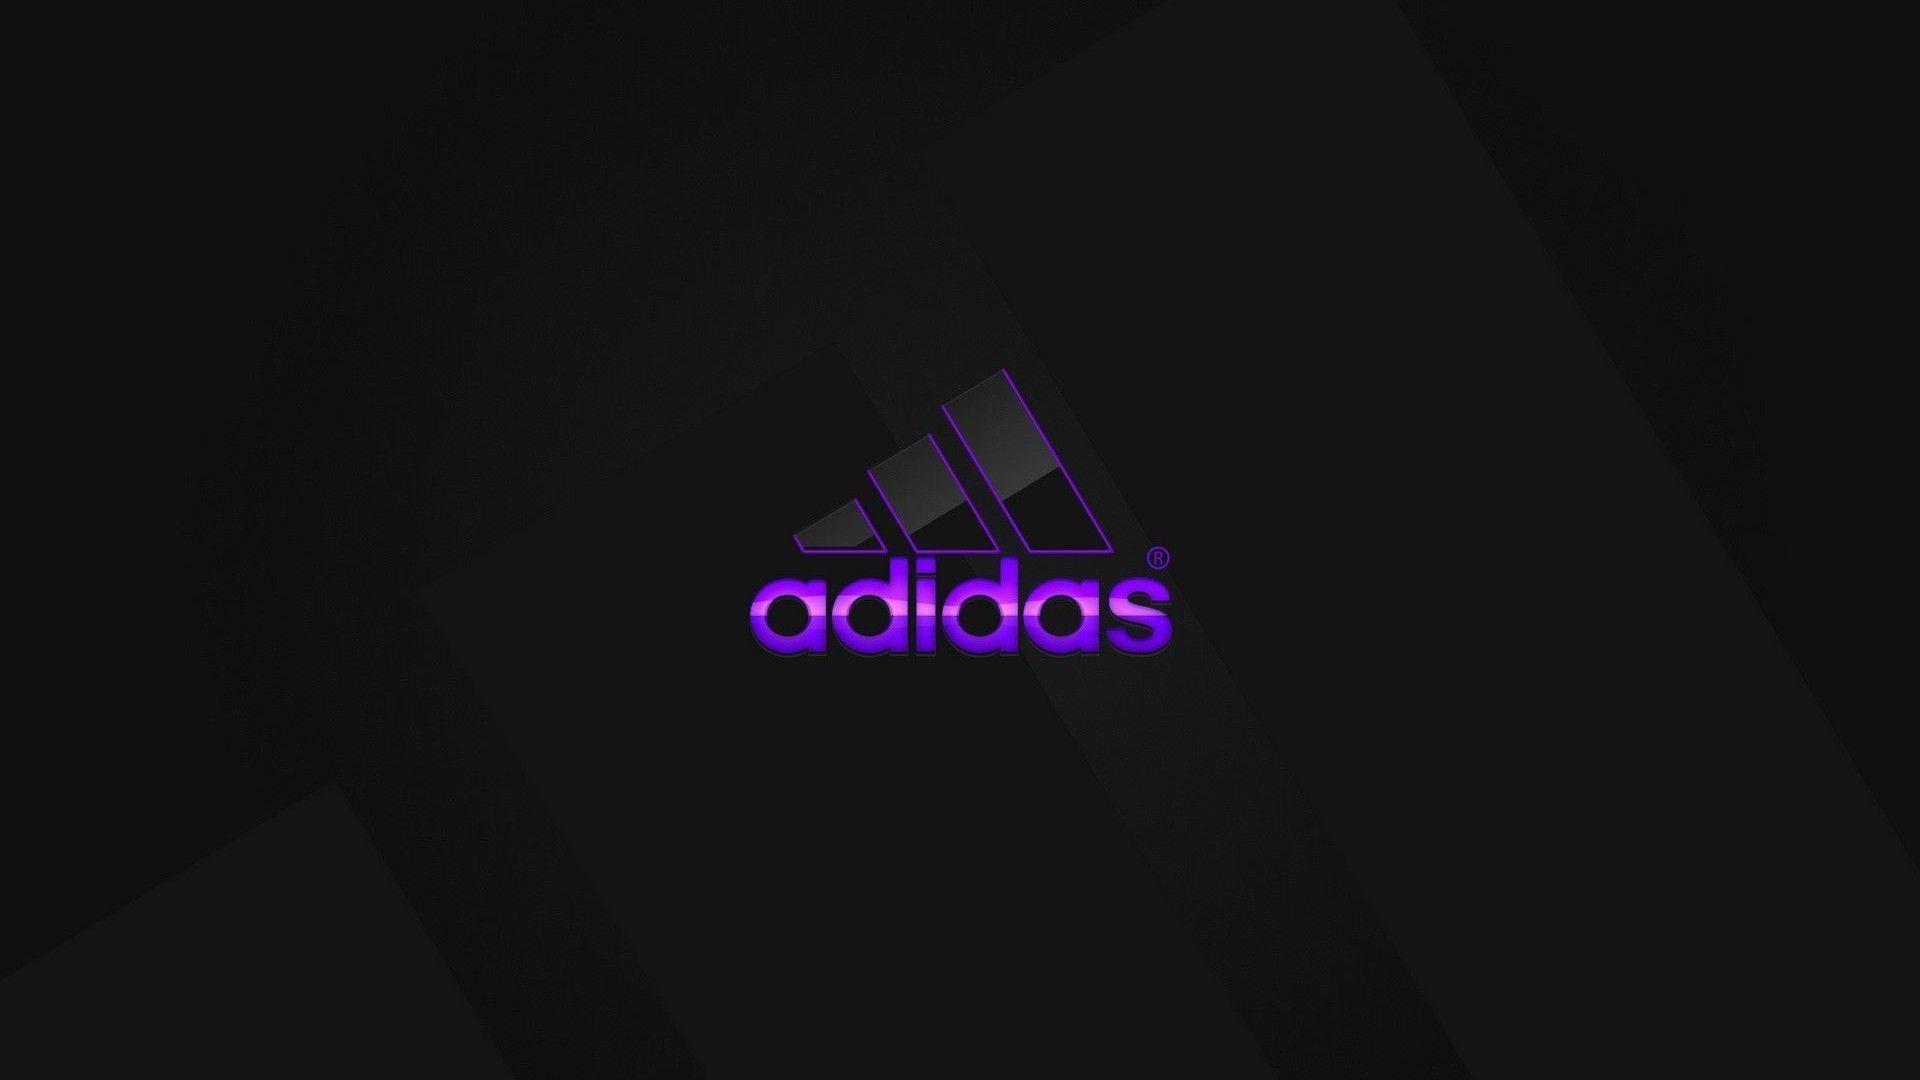 Manchester United Wallpaper Iphone X Adidas Wallpaper 2018 183 ①